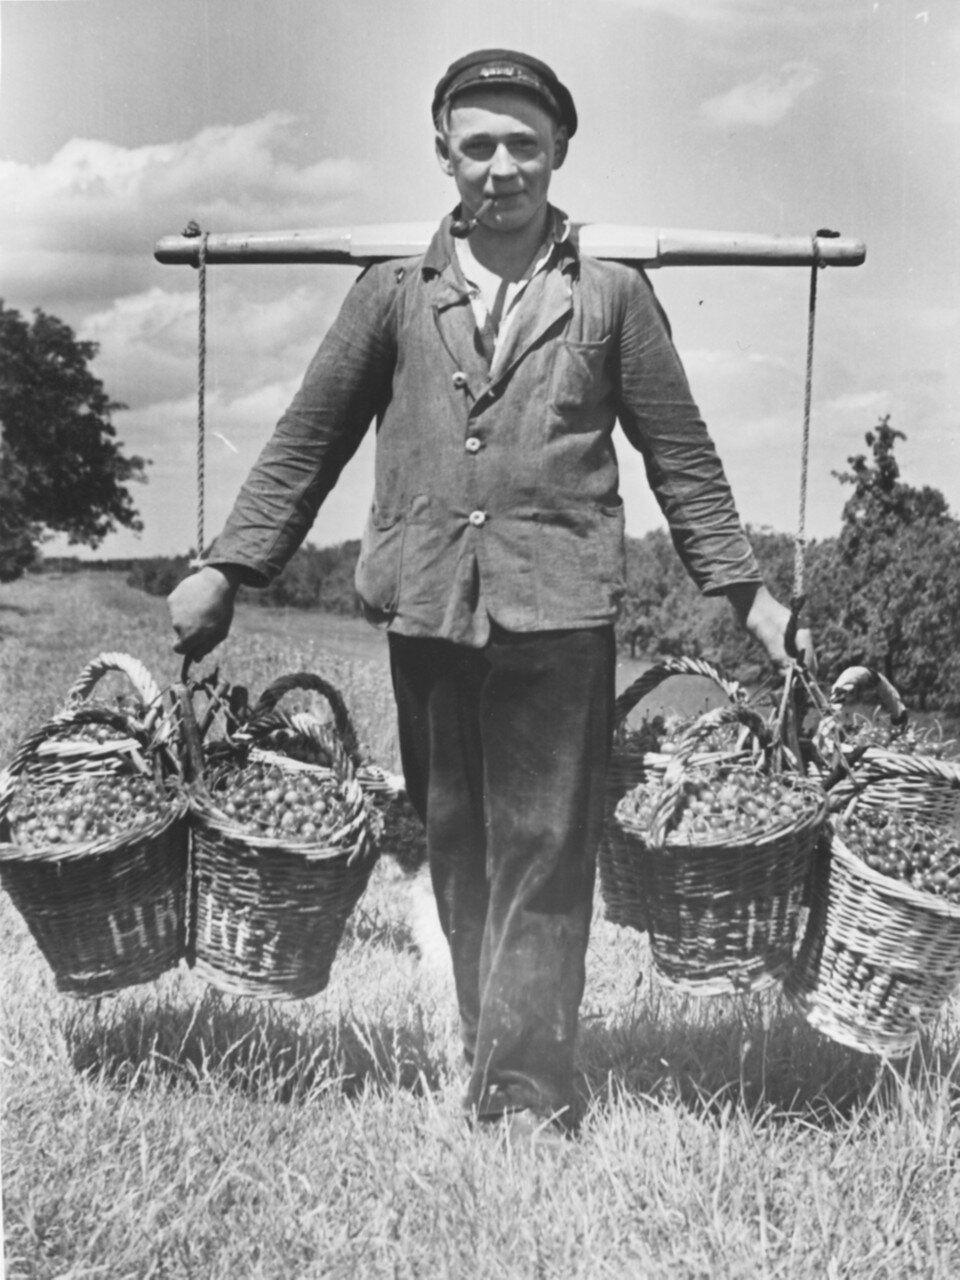 Гамбург. Сбор вишни. Фермер с корзинами, наполненными вишнями